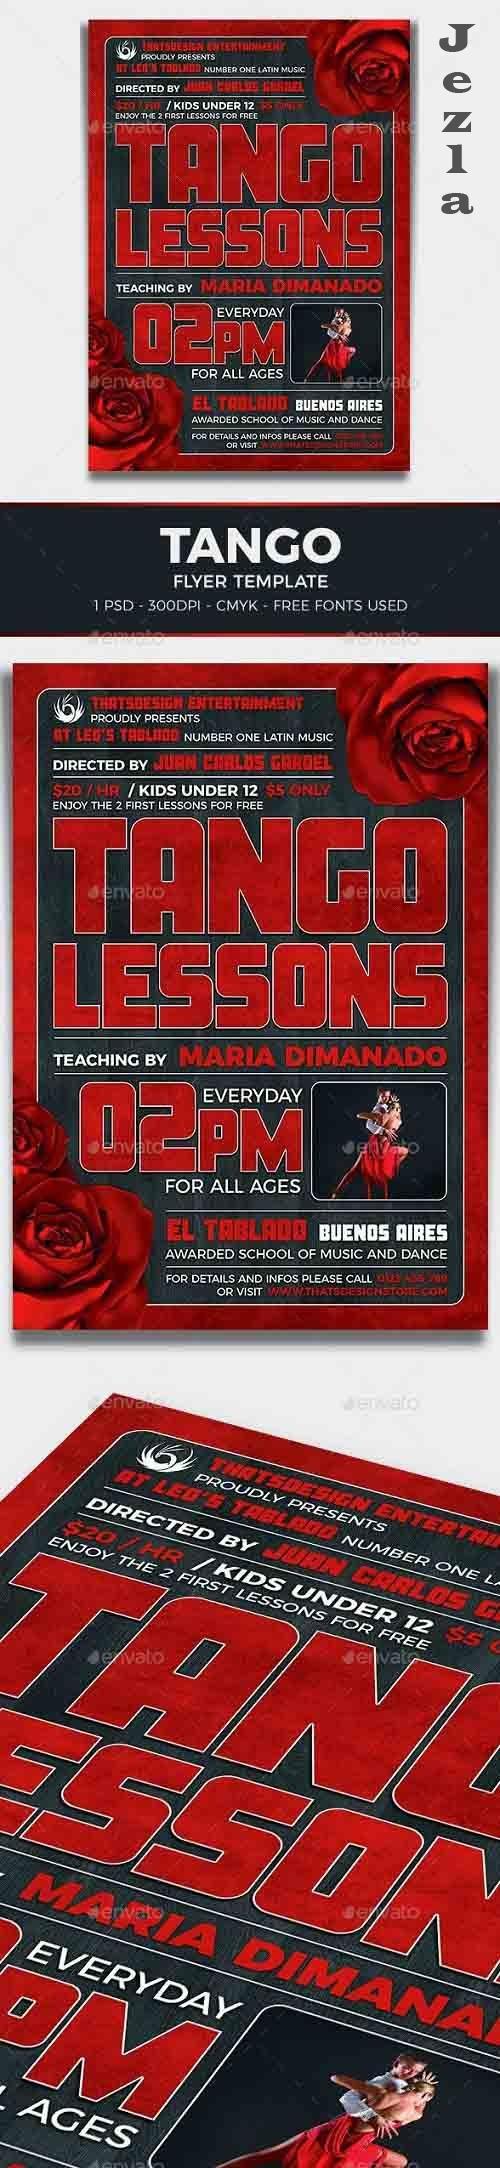 Tango Flyer Template V2 - 17227573 - 802968